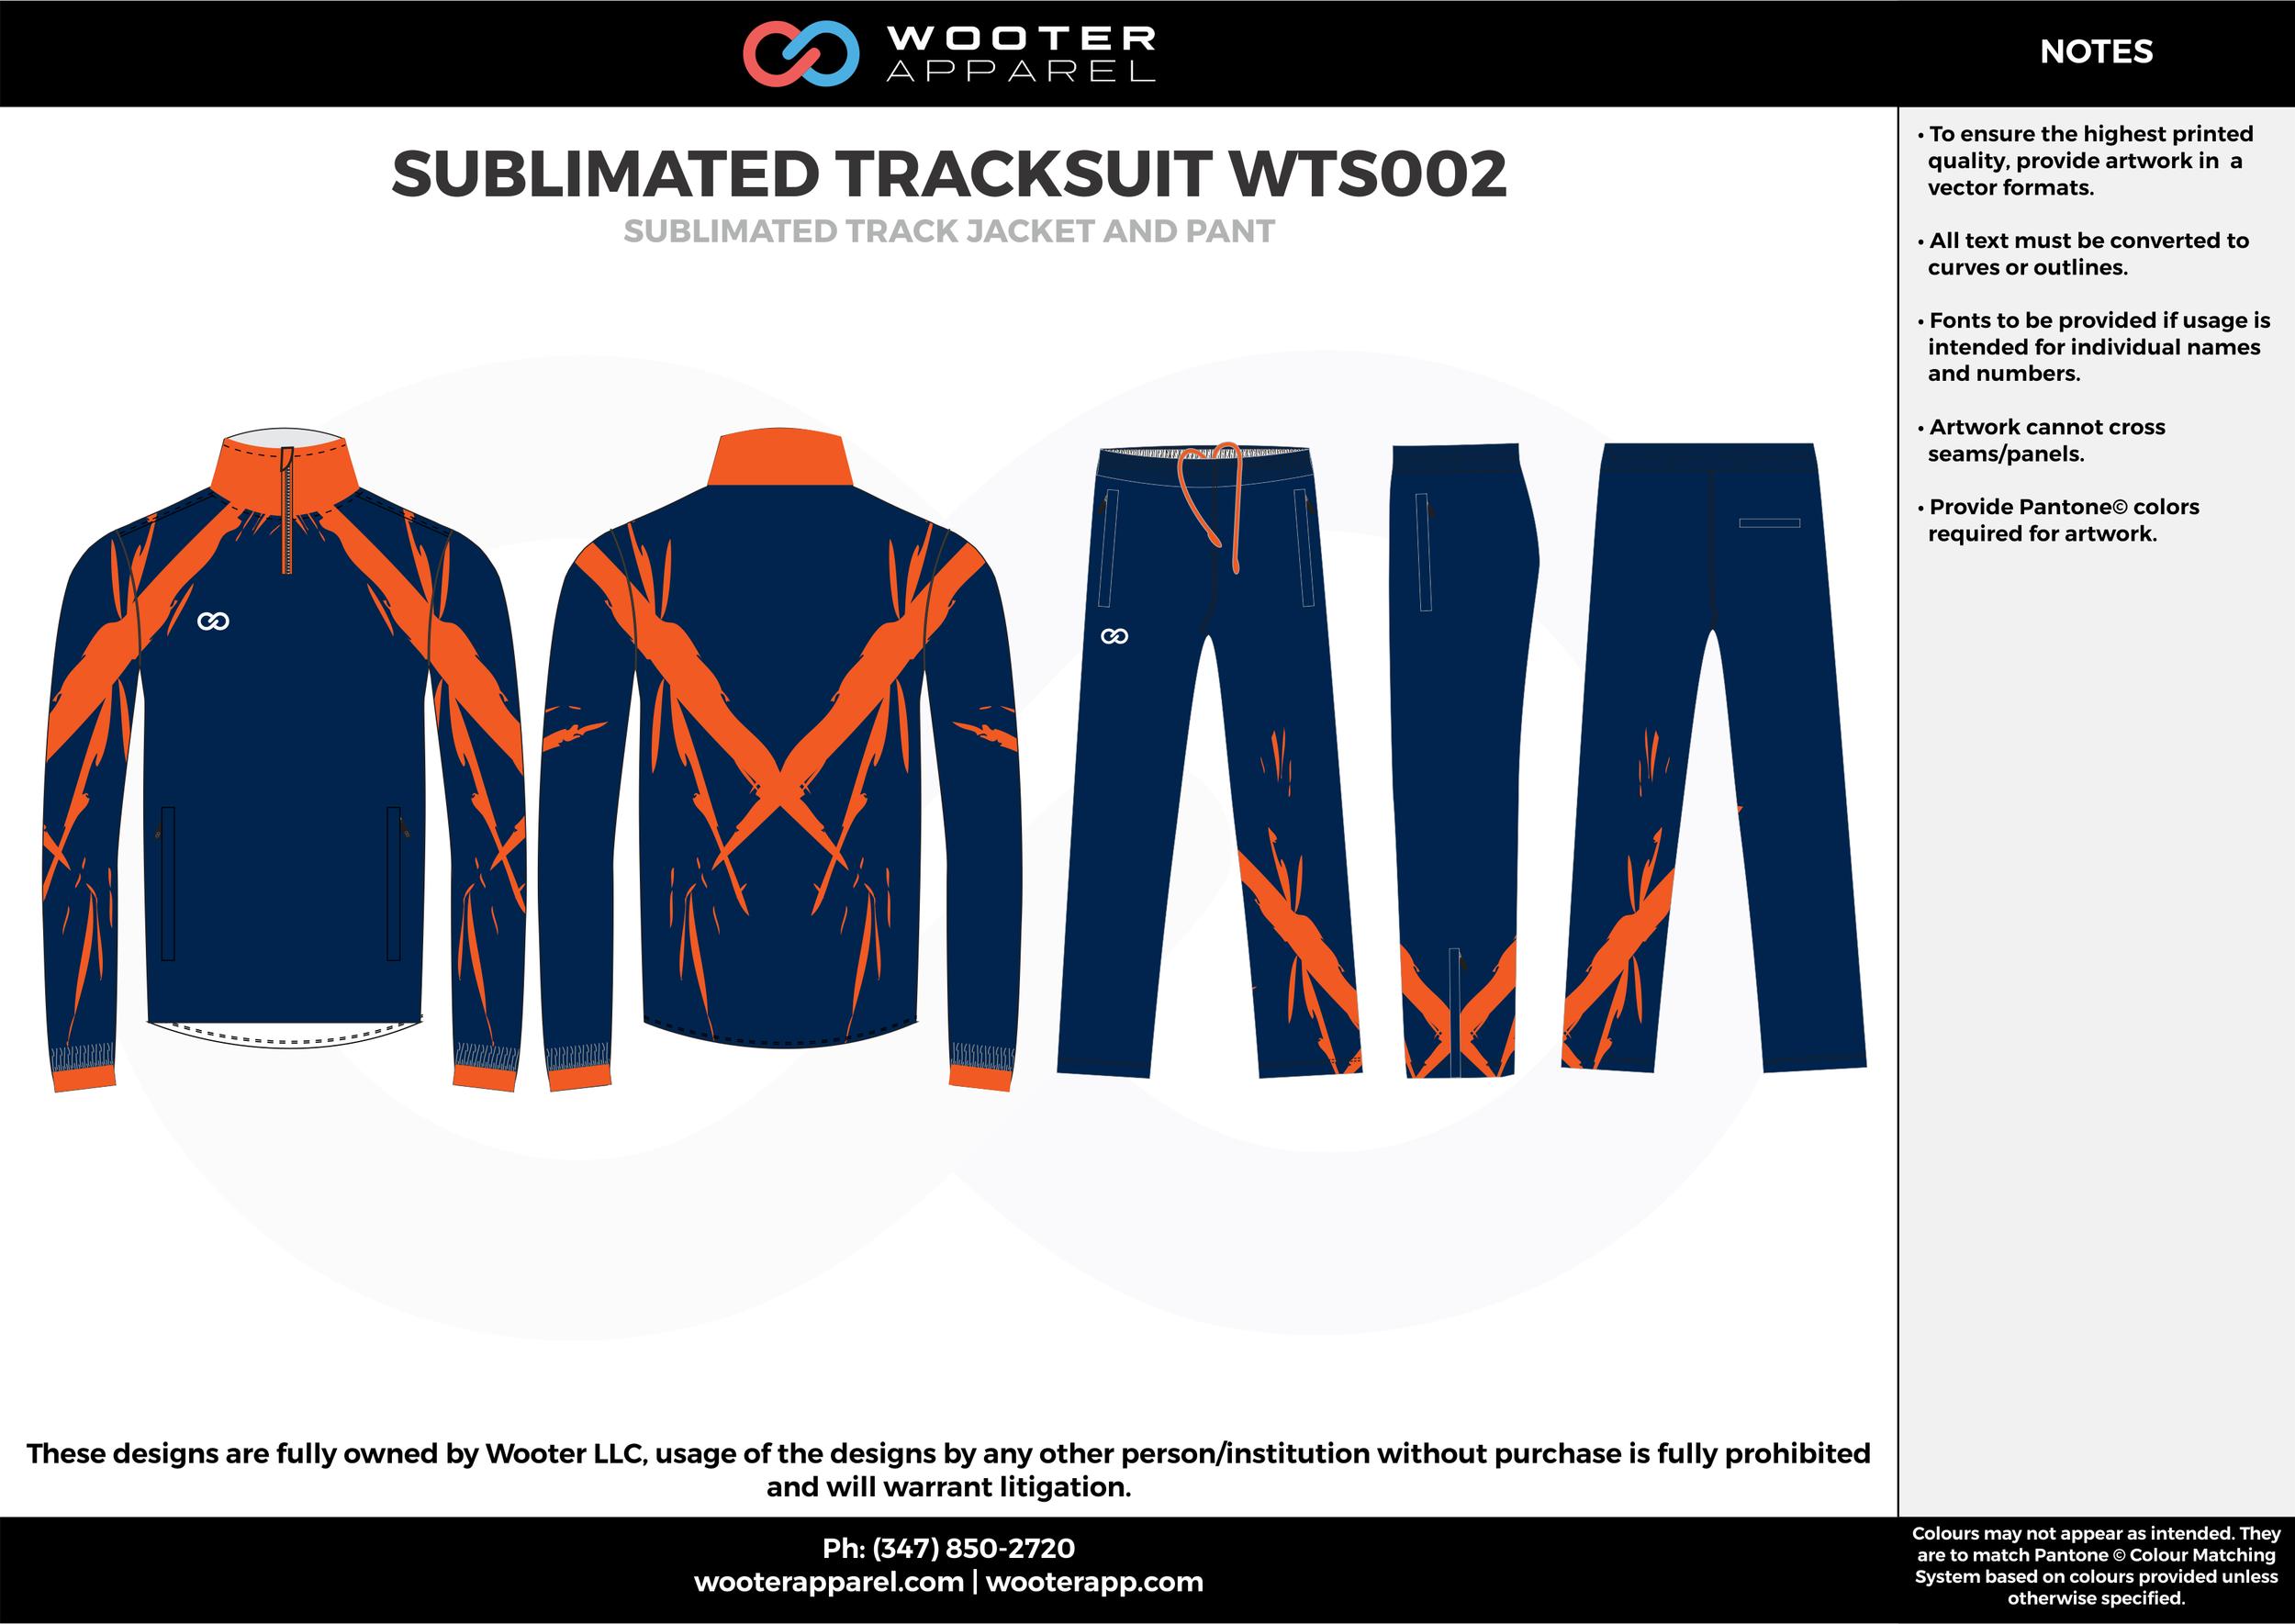 SUBLIMATED TRACKSUIT WTS002 navy blue orange  Track Jacket, Track Pants, Tracksuit, Warmup Suit